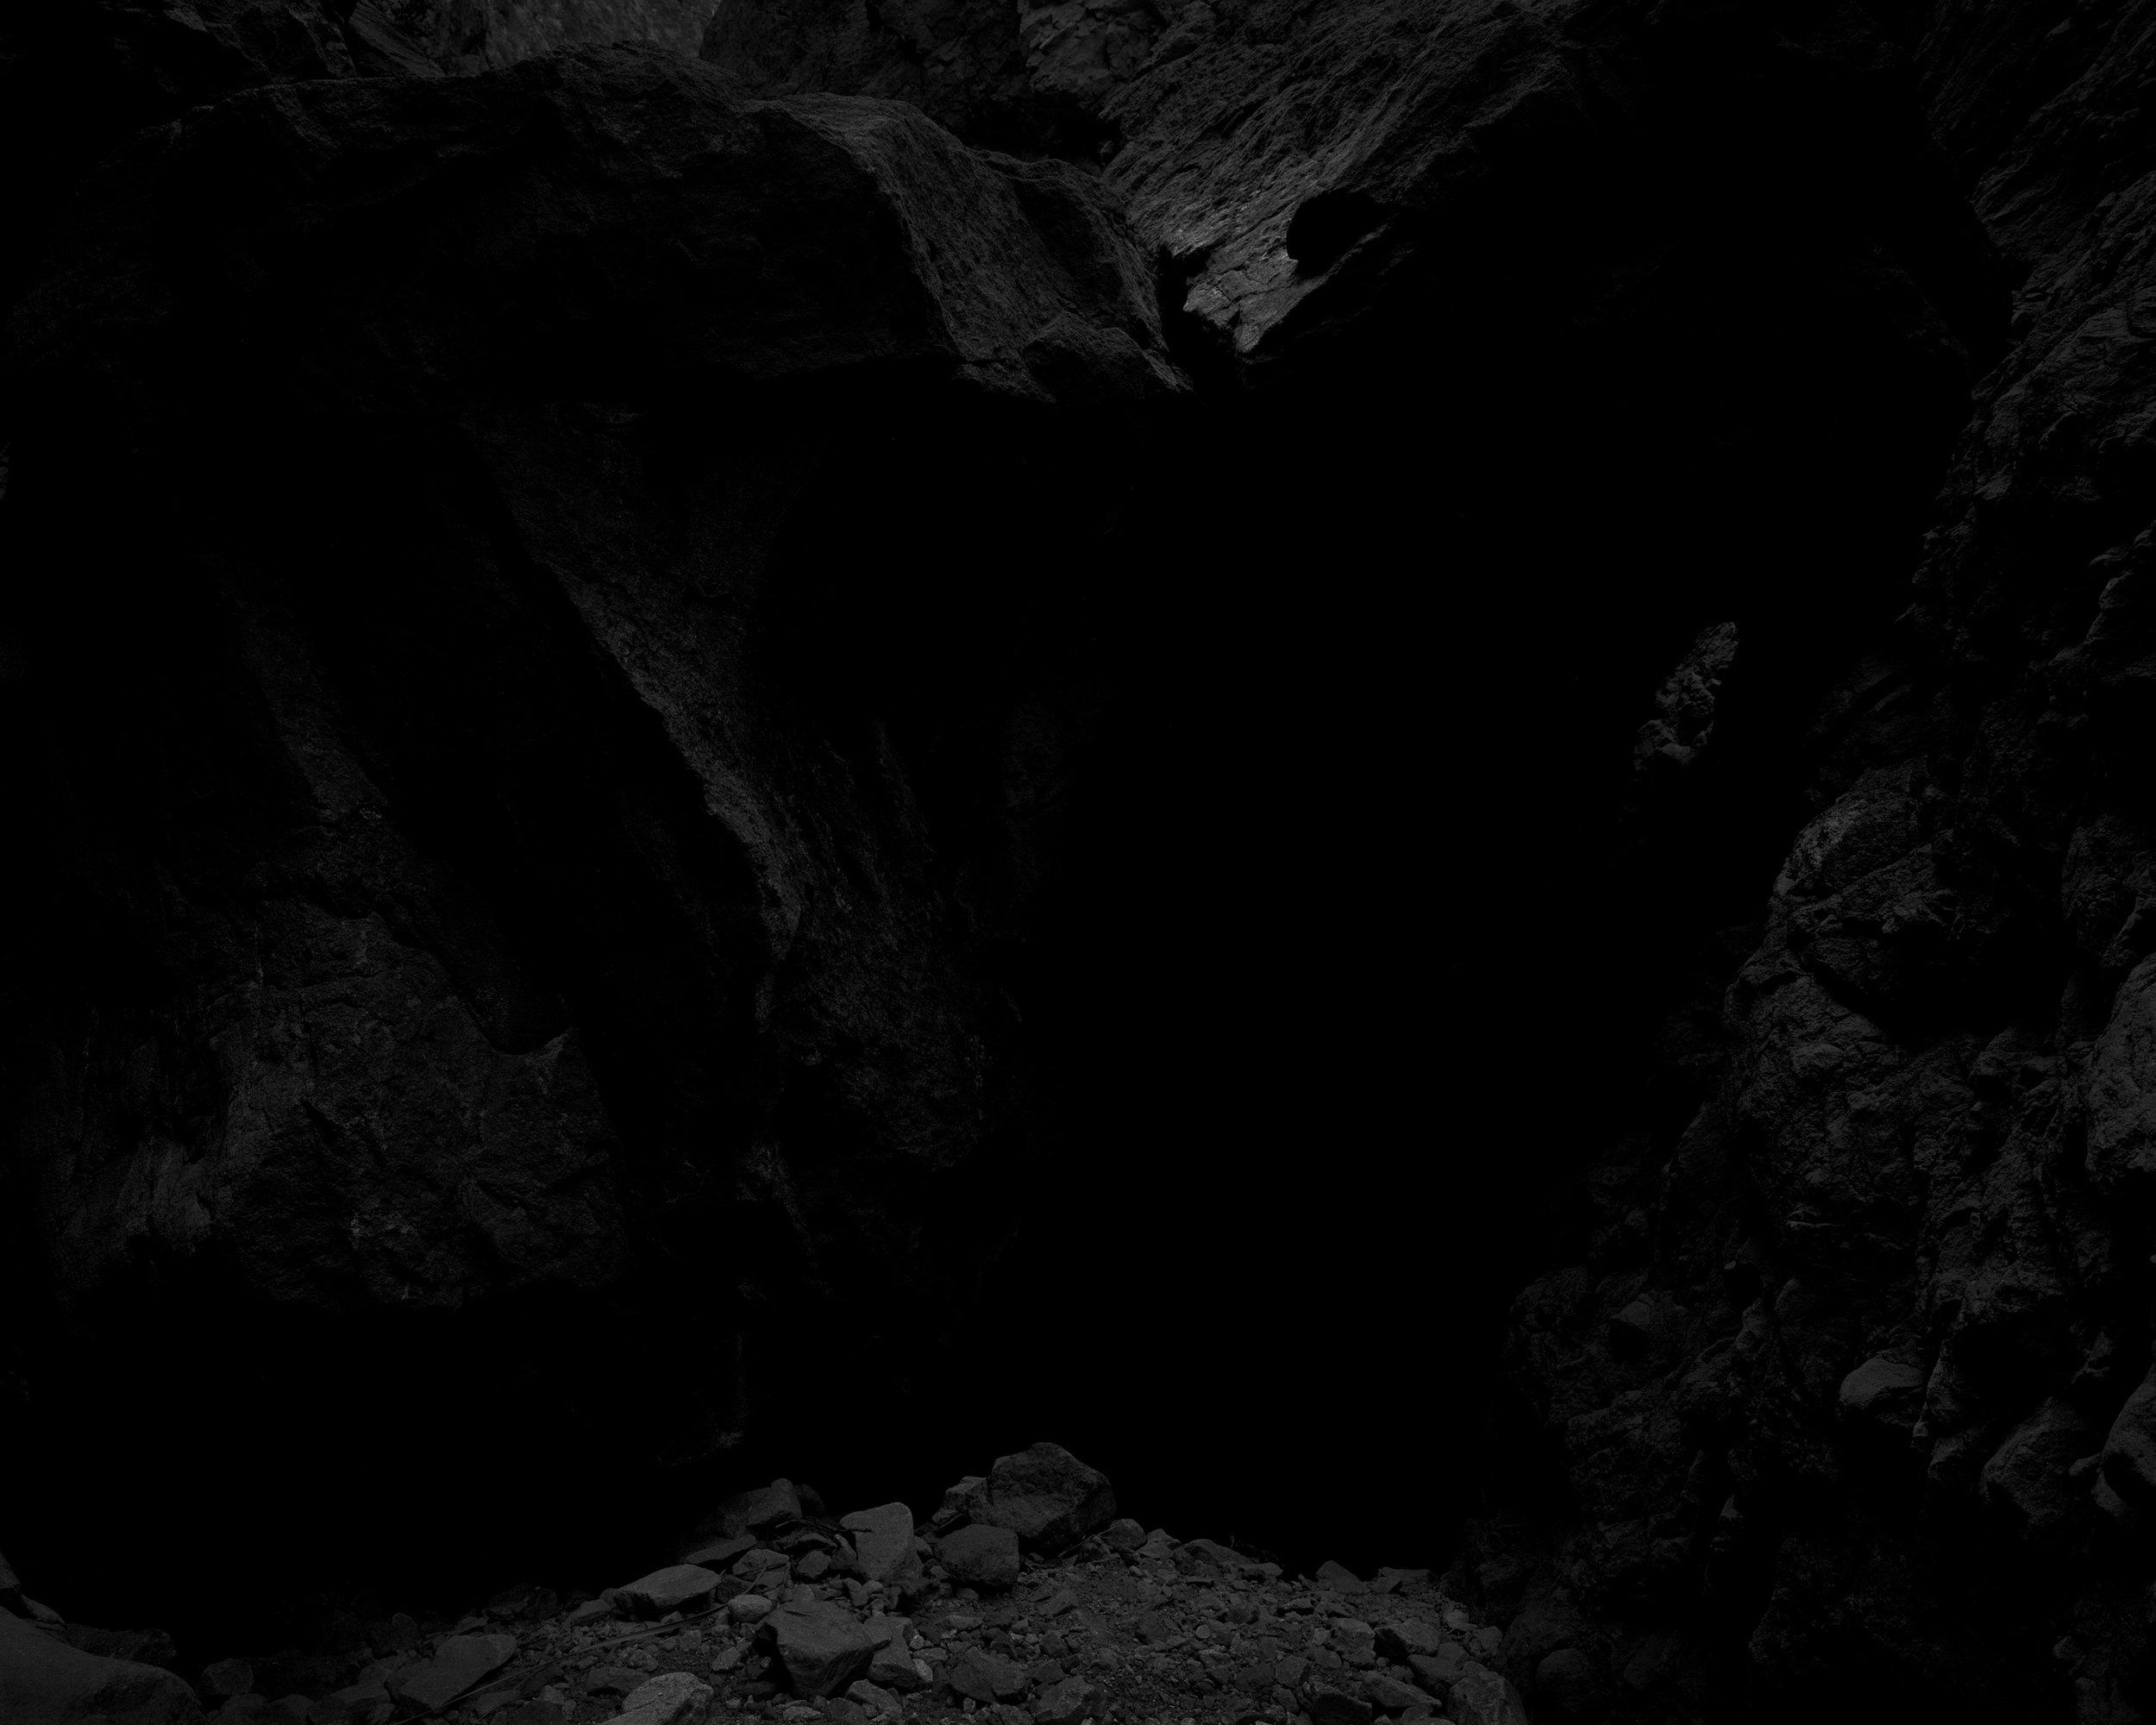 MICHAEL LUNDGREN  Darkening, 2002  Gelatin Silver Print  Available sizes 20 x 24 in, ed. 10 + 2AP 32 x 40 in, ed. 3 + 1AP